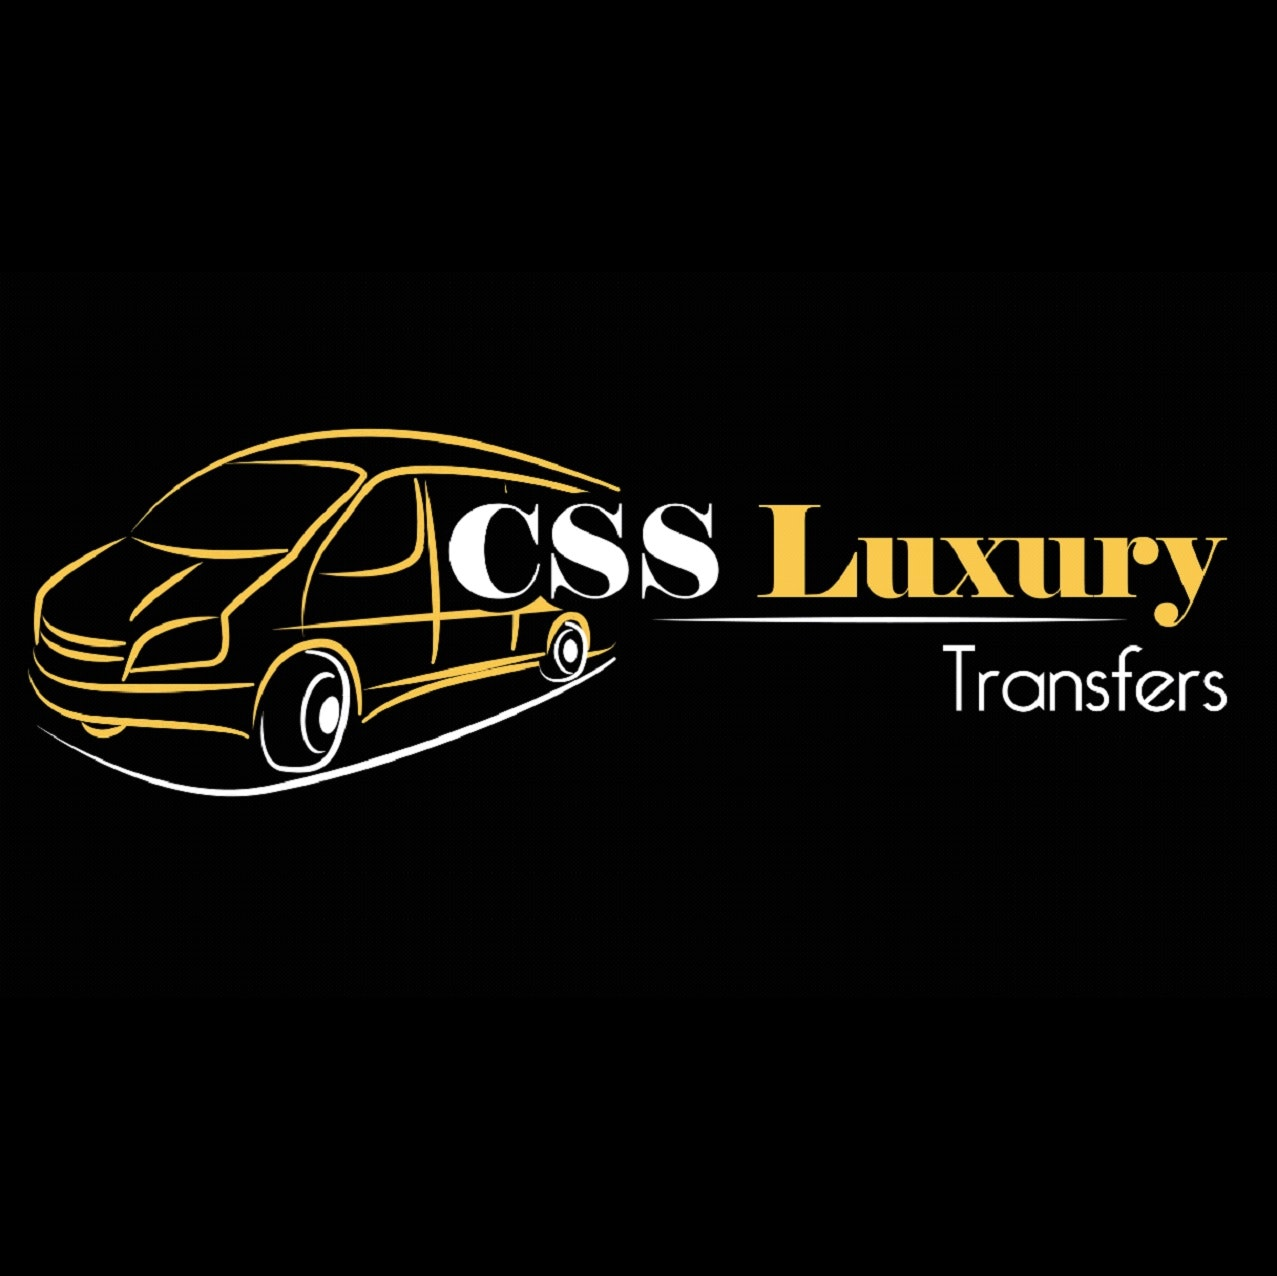 CSS Luxury Transfers